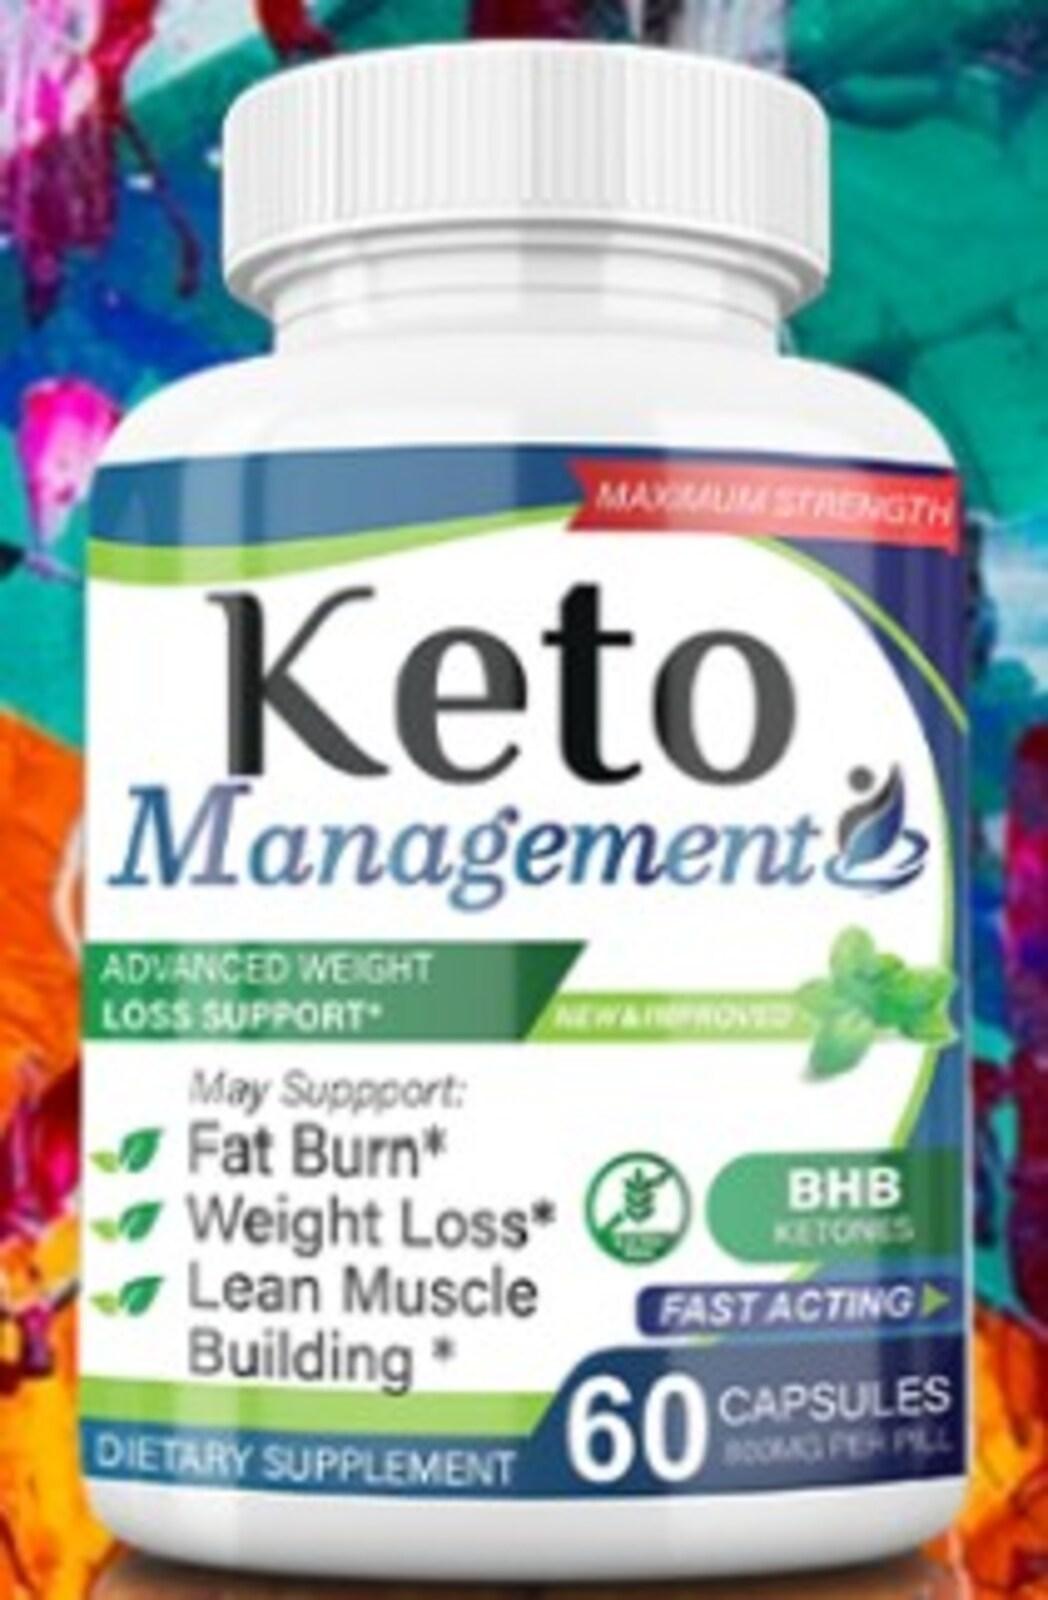 Keto Management